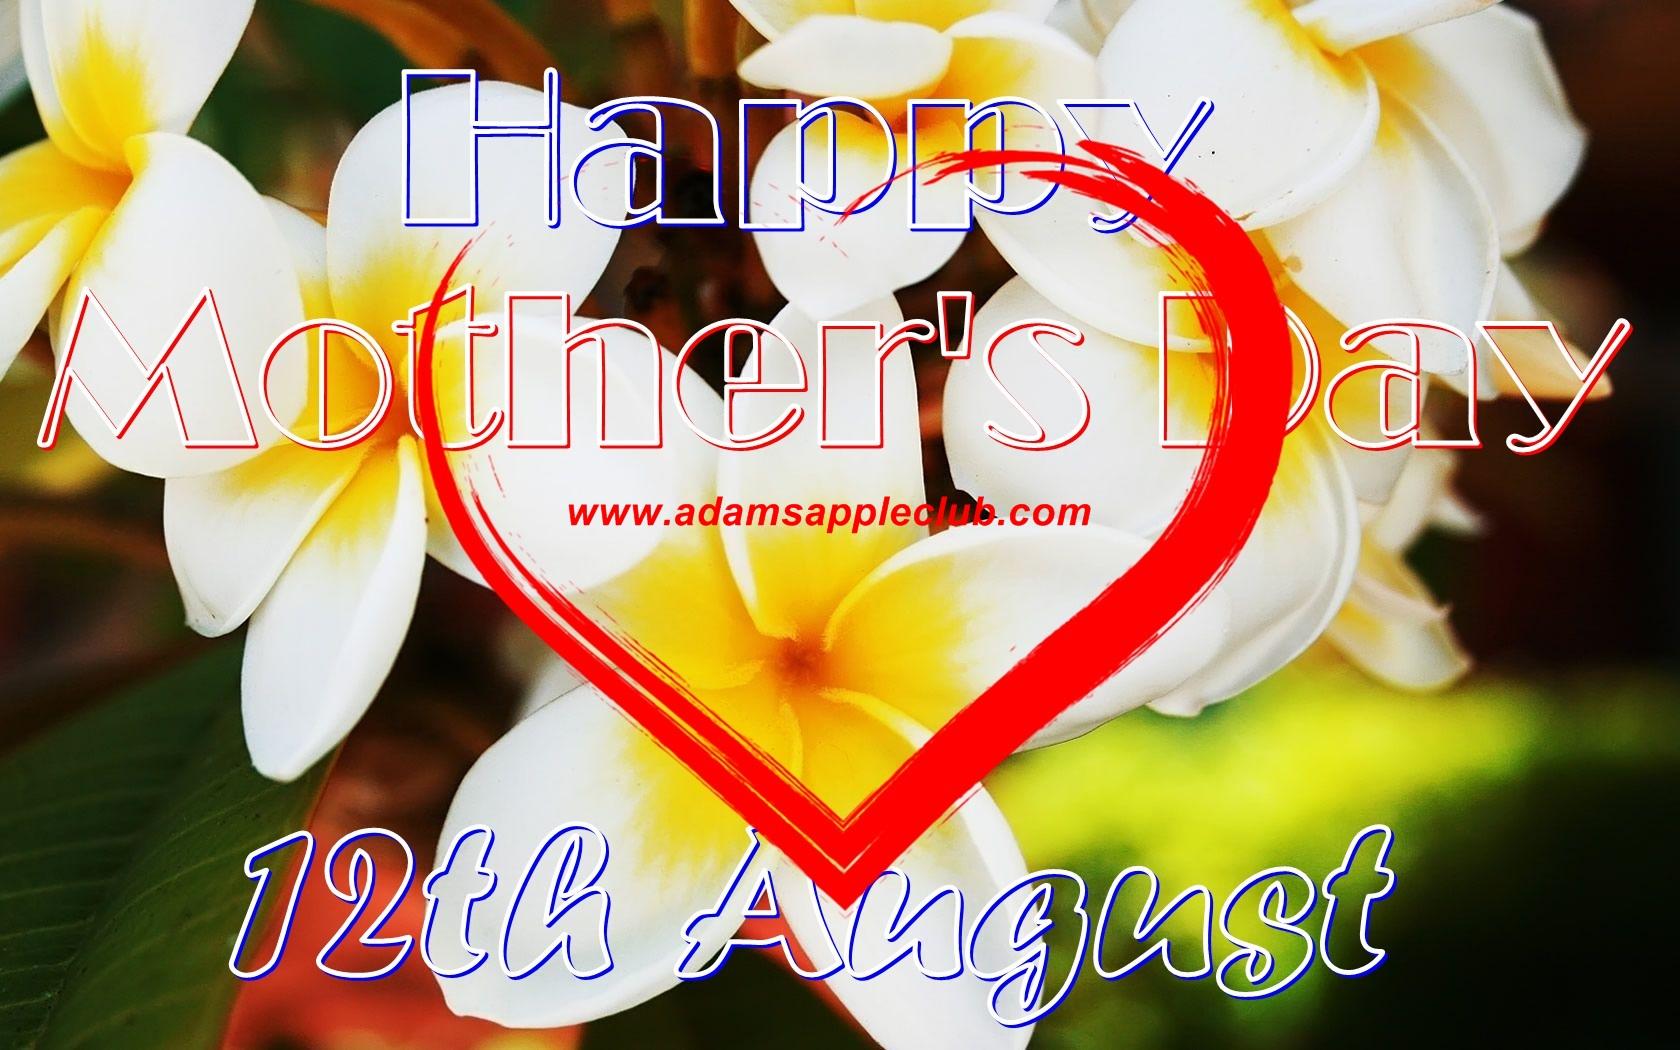 Mother's Day 2019 Adams Apple Club